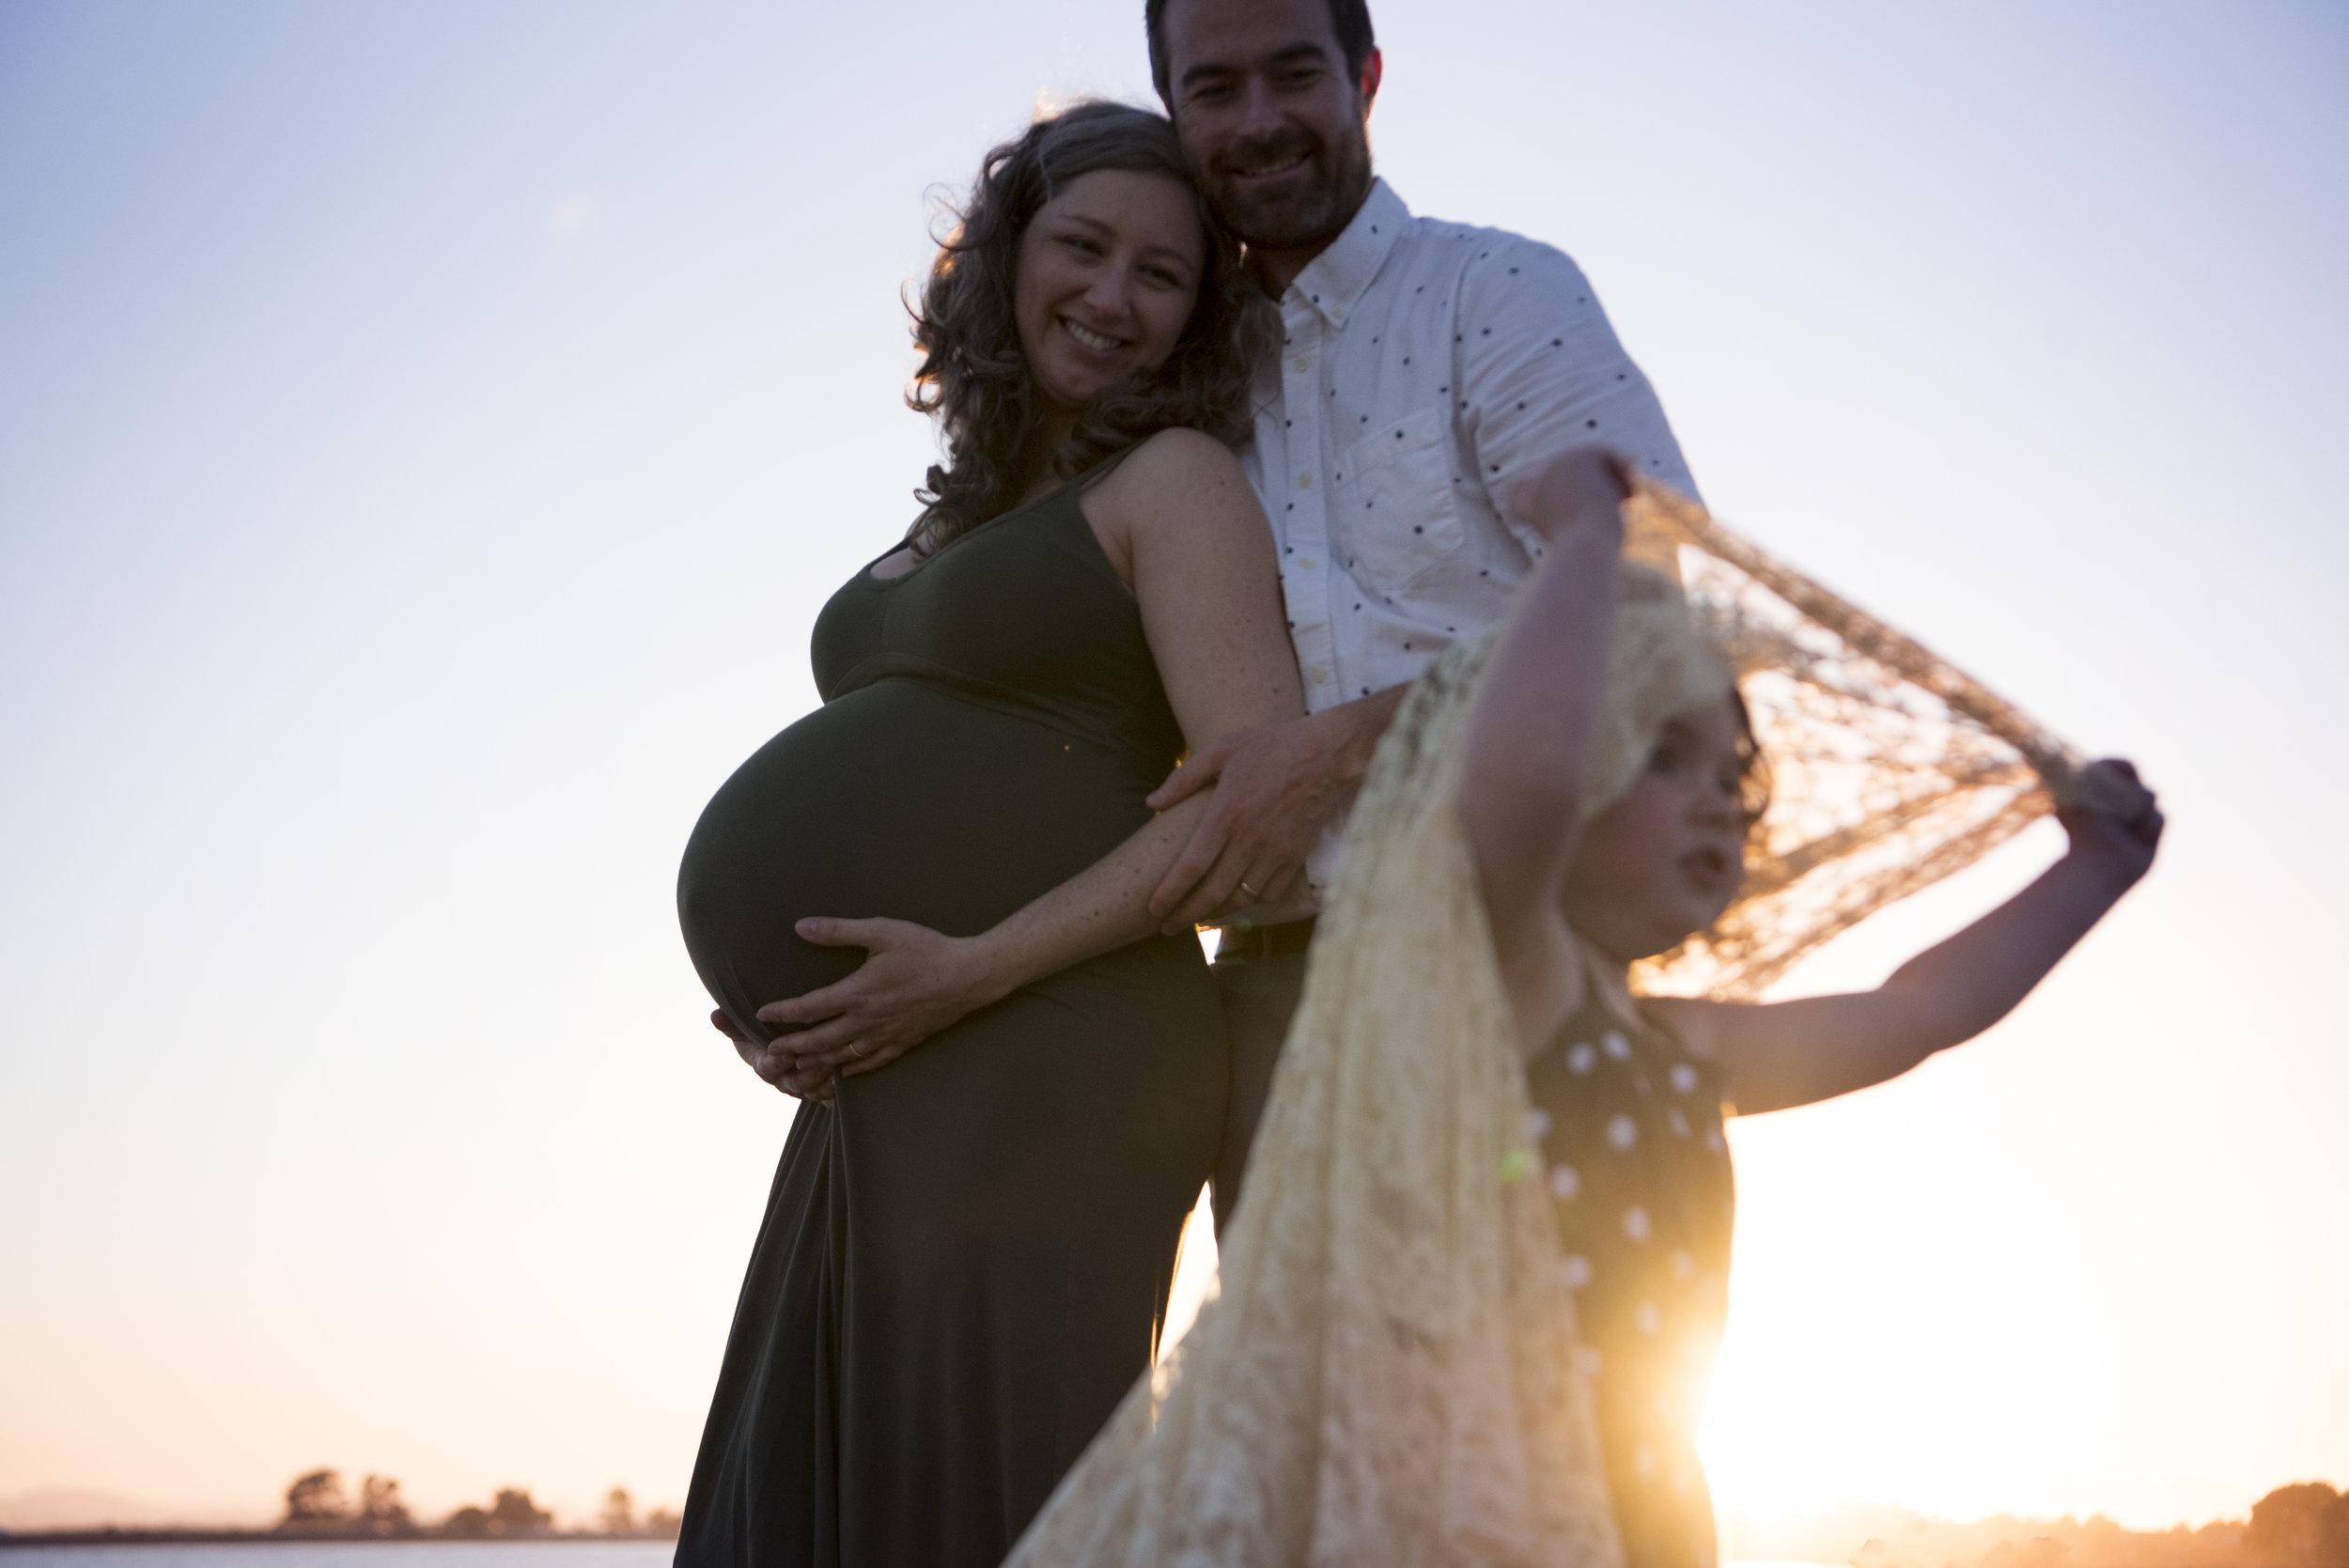 Lets_Spread_Beauty_Photography_Maternity20150620_0013.jpg